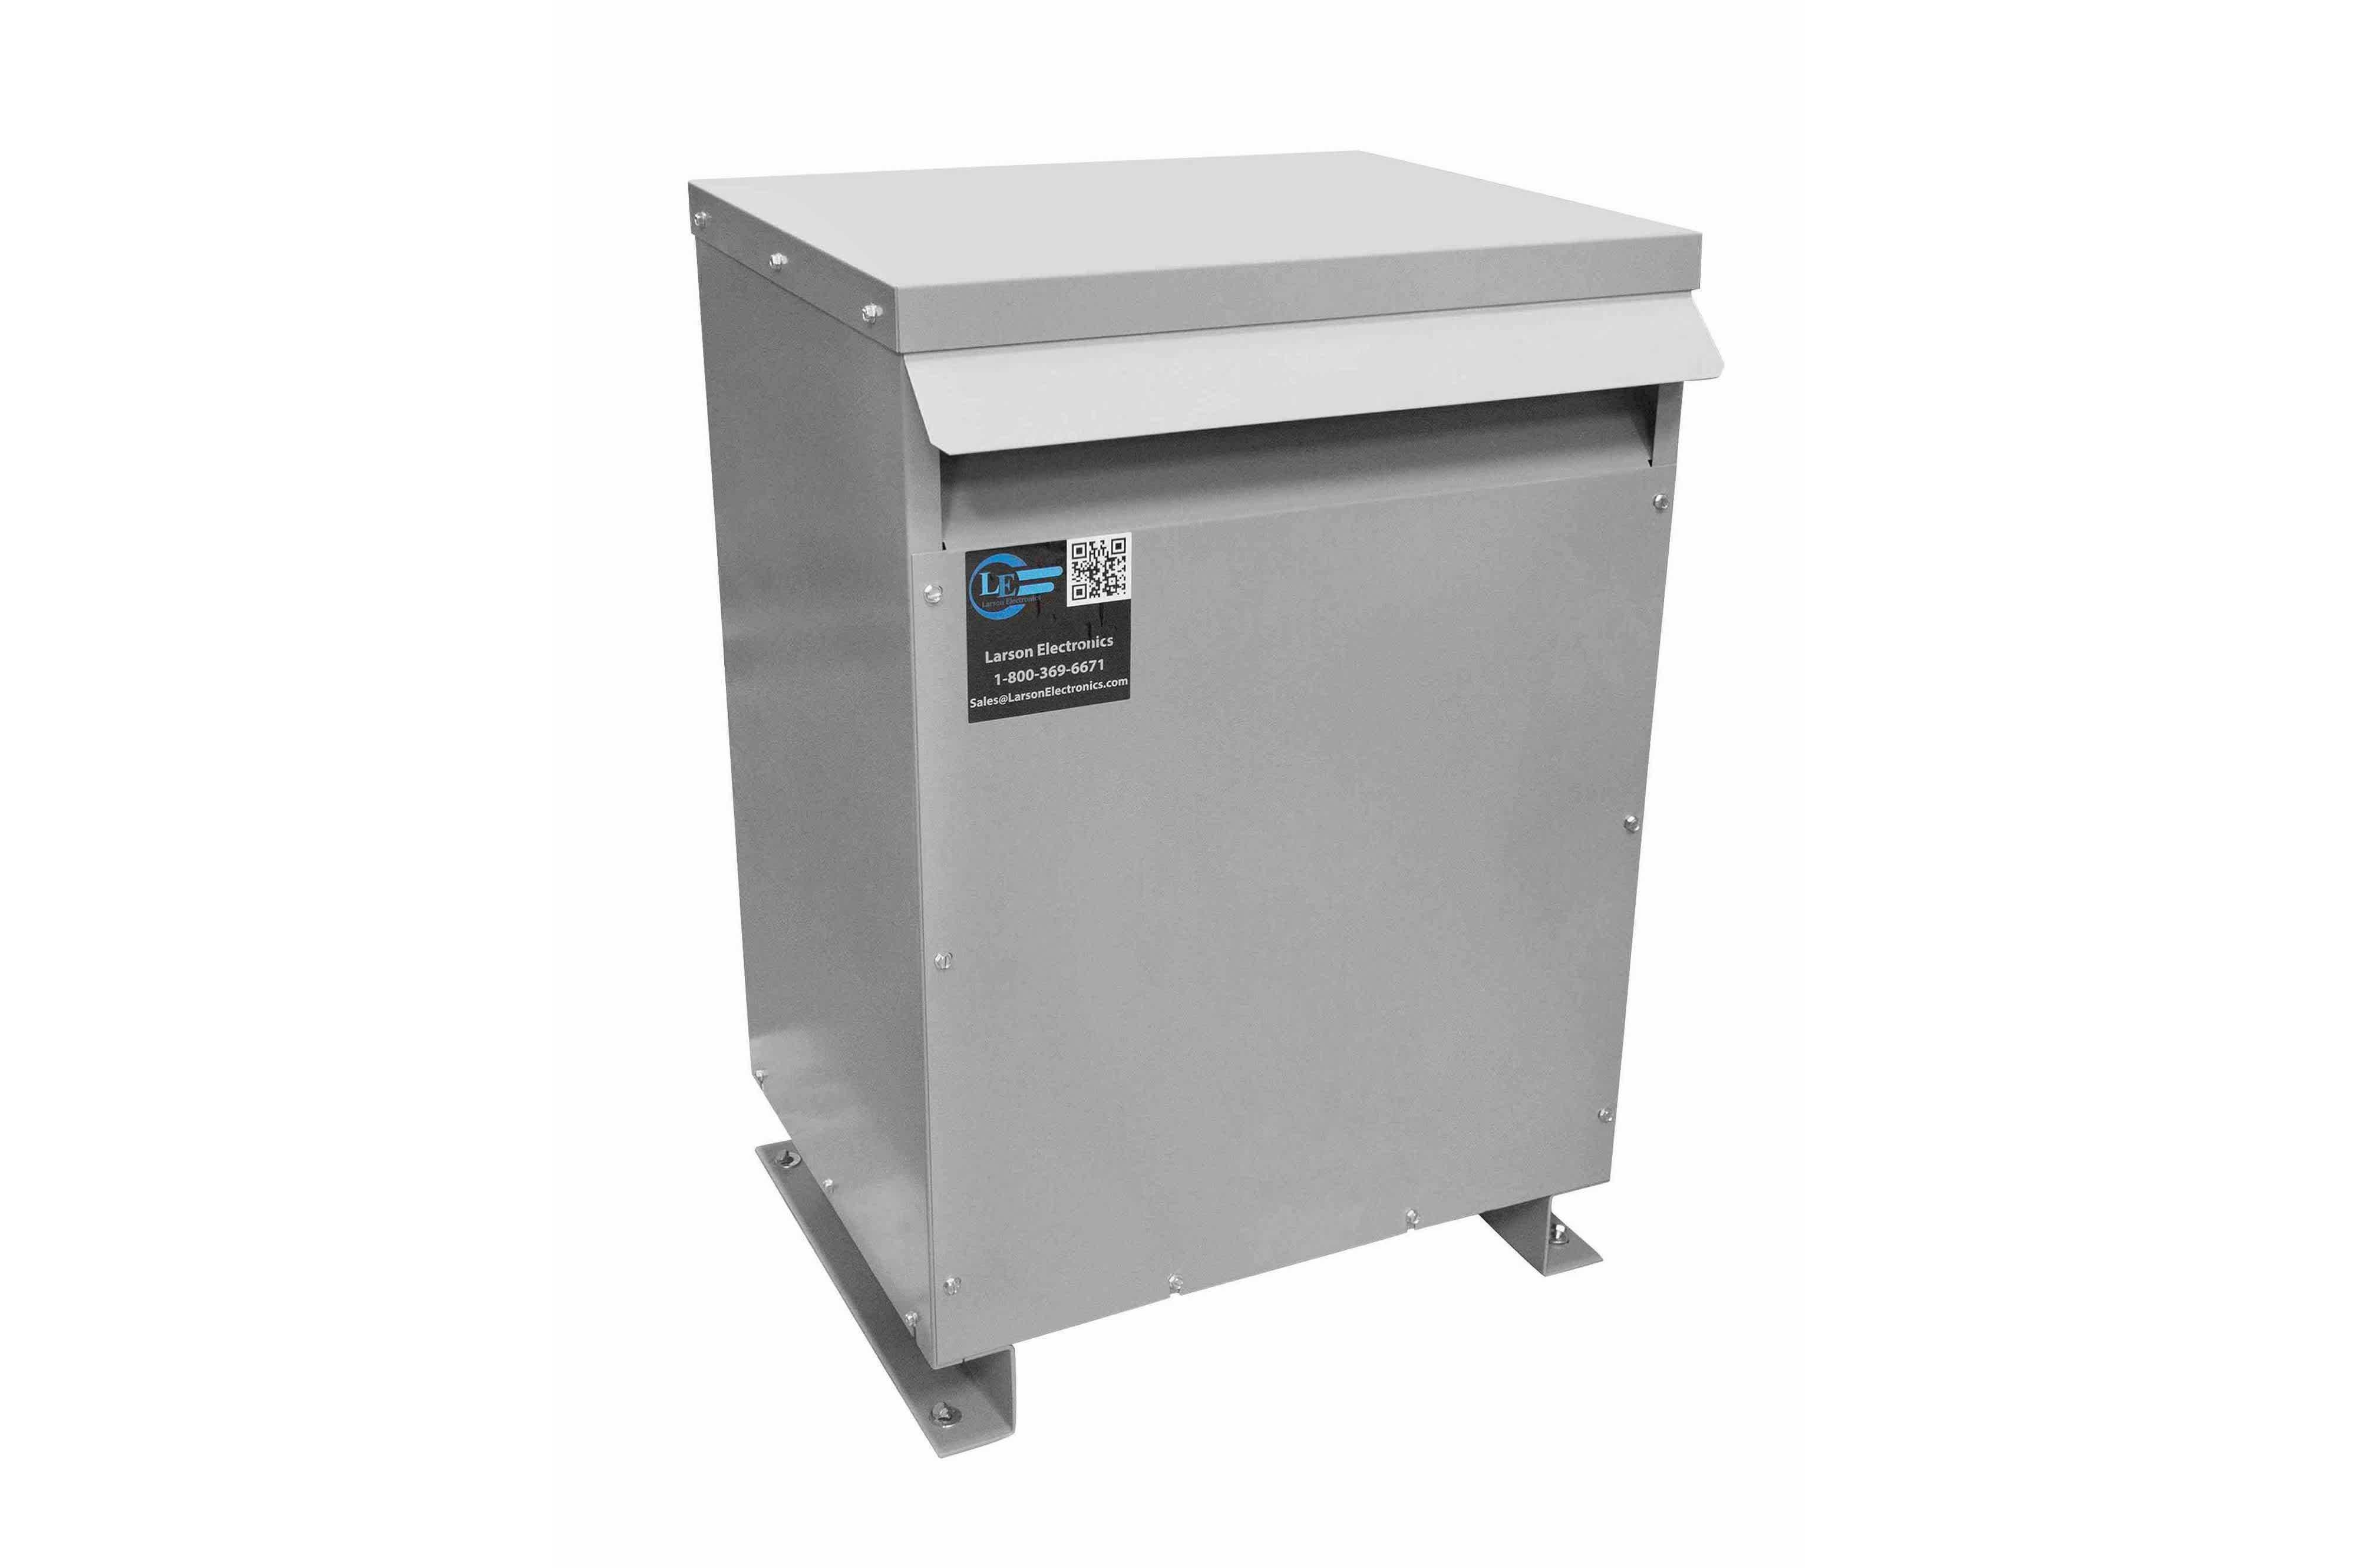 11 kVA 3PH Isolation Transformer, 415V Wye Primary, 208Y/120 Wye-N Secondary, N3R, Ventilated, 60 Hz